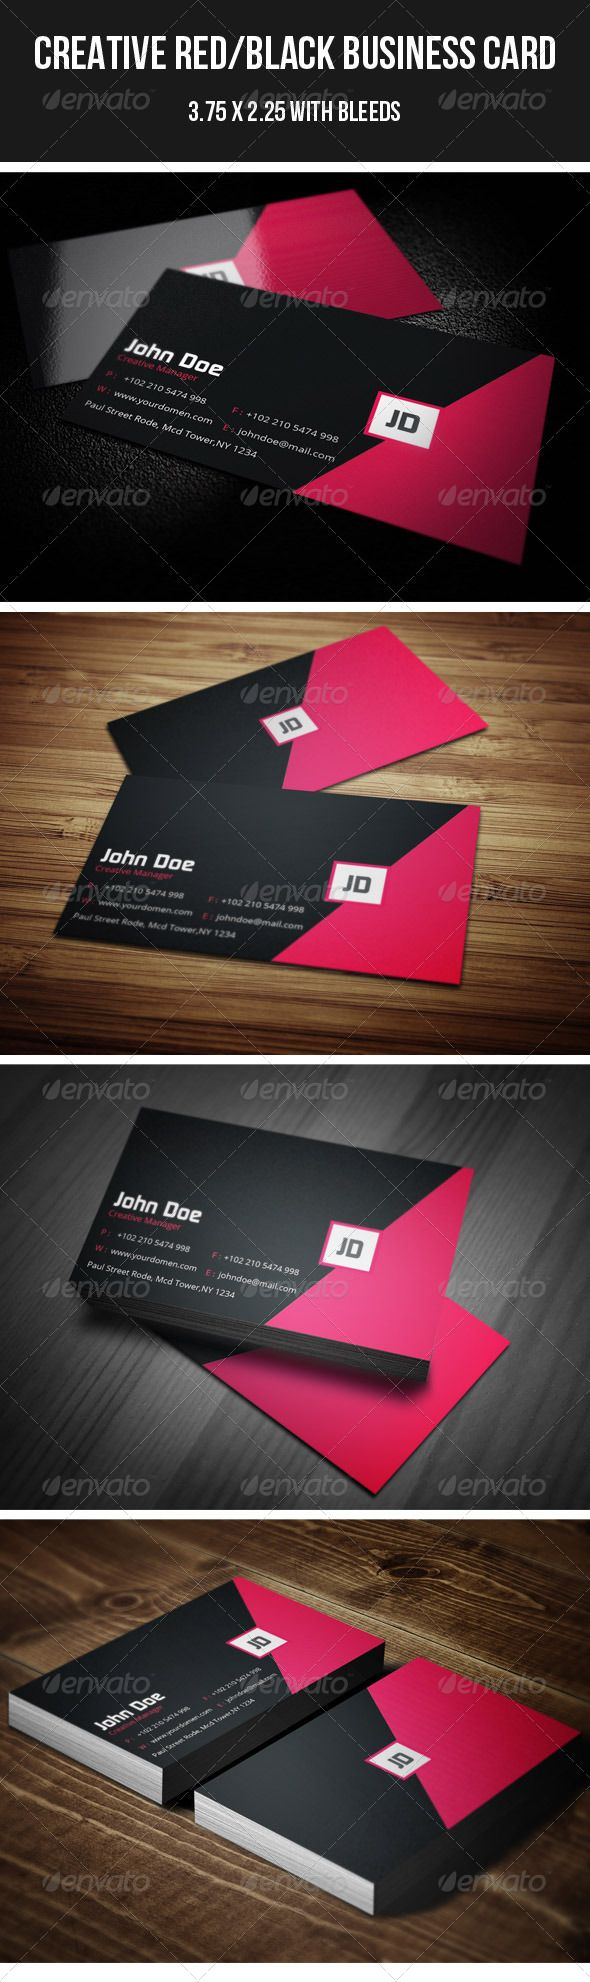 1469 best minimal business card design images on pinterest fonts creative redblack business card 37 magicingreecefo Gallery